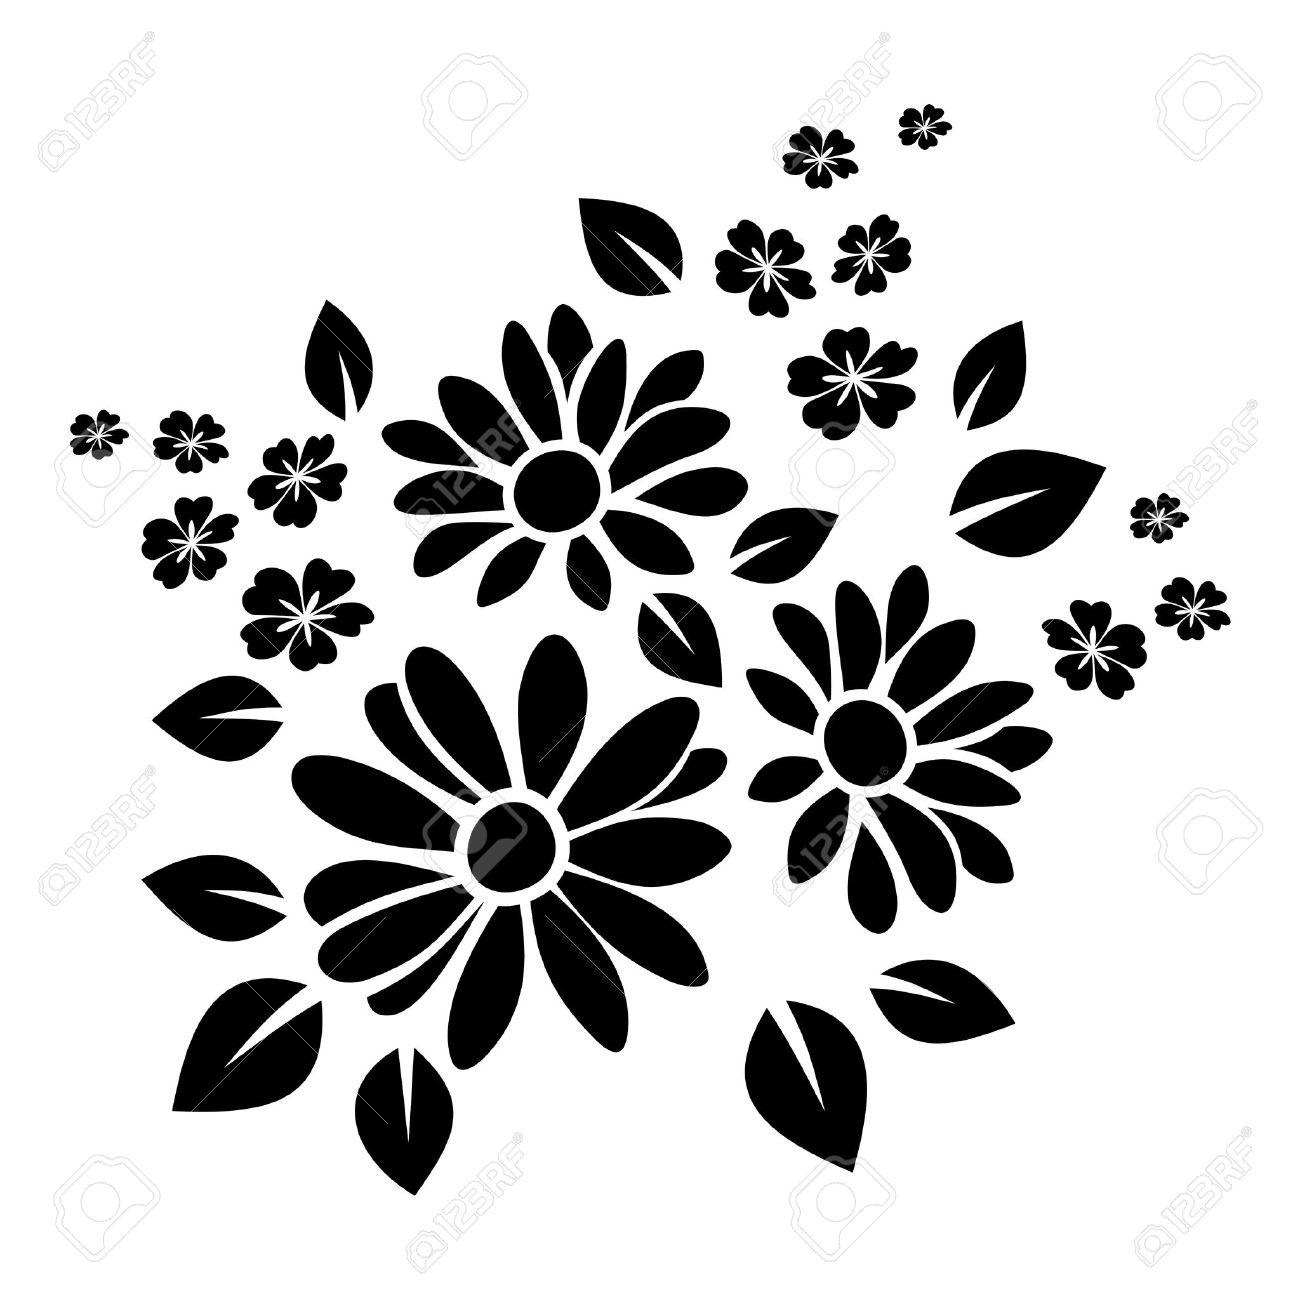 black silhouette of flowers